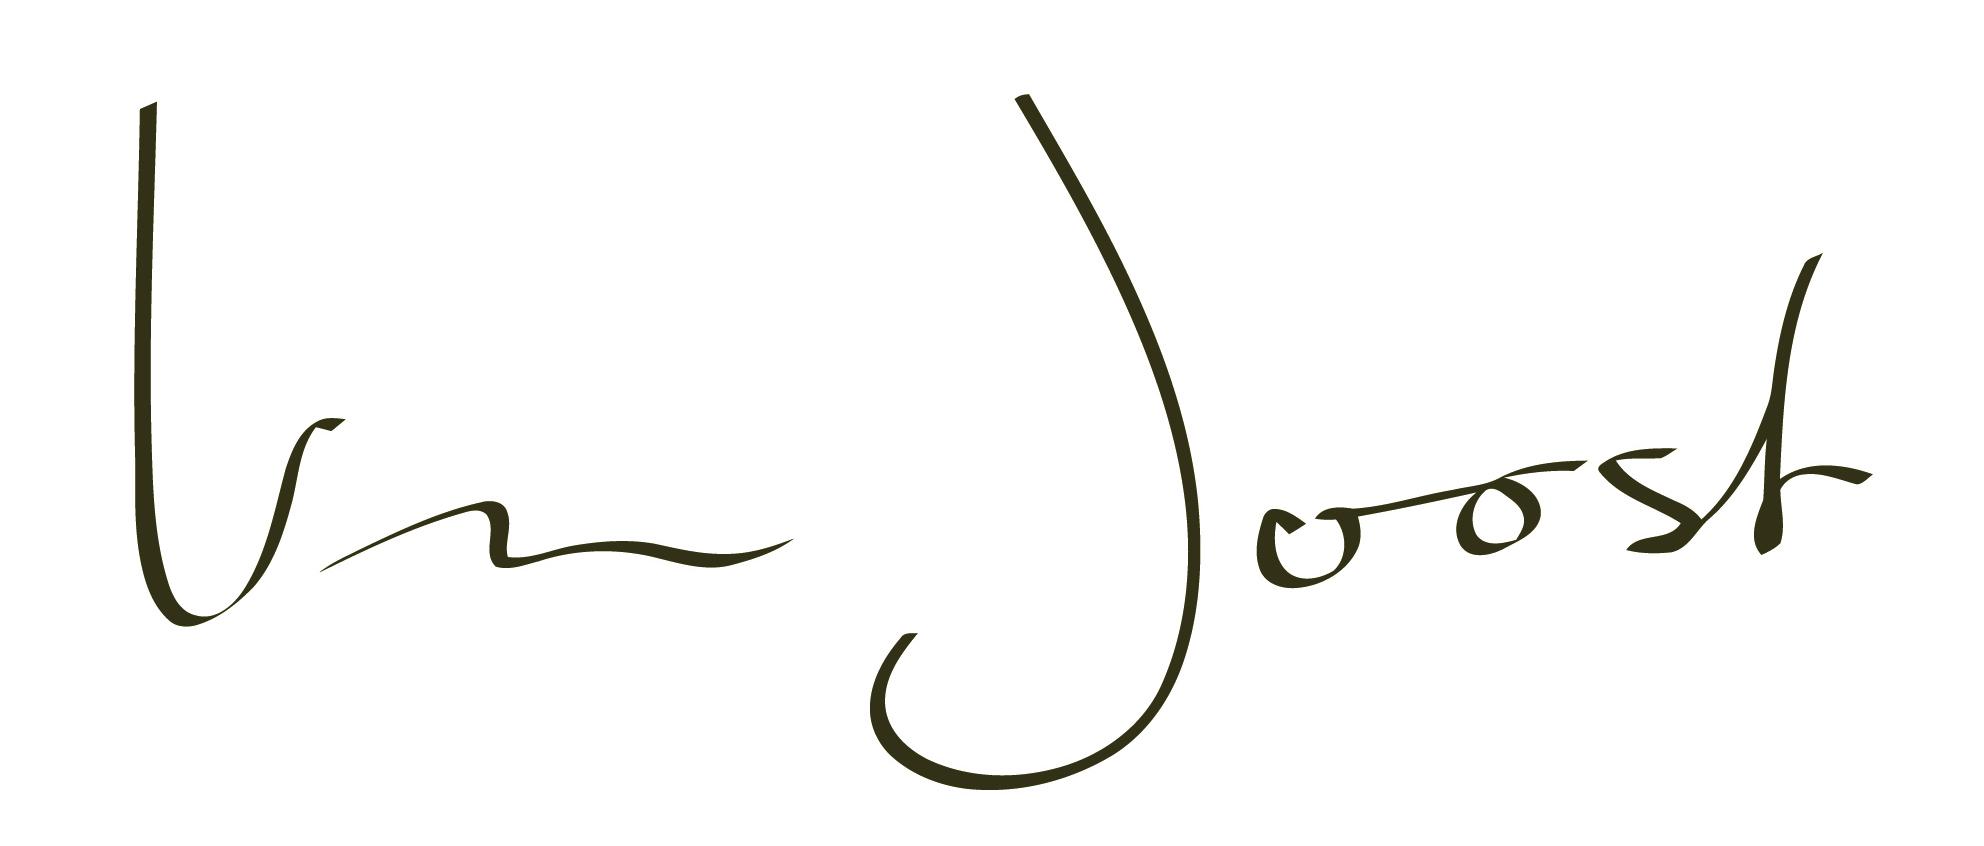 Logo VanJoost copy-1